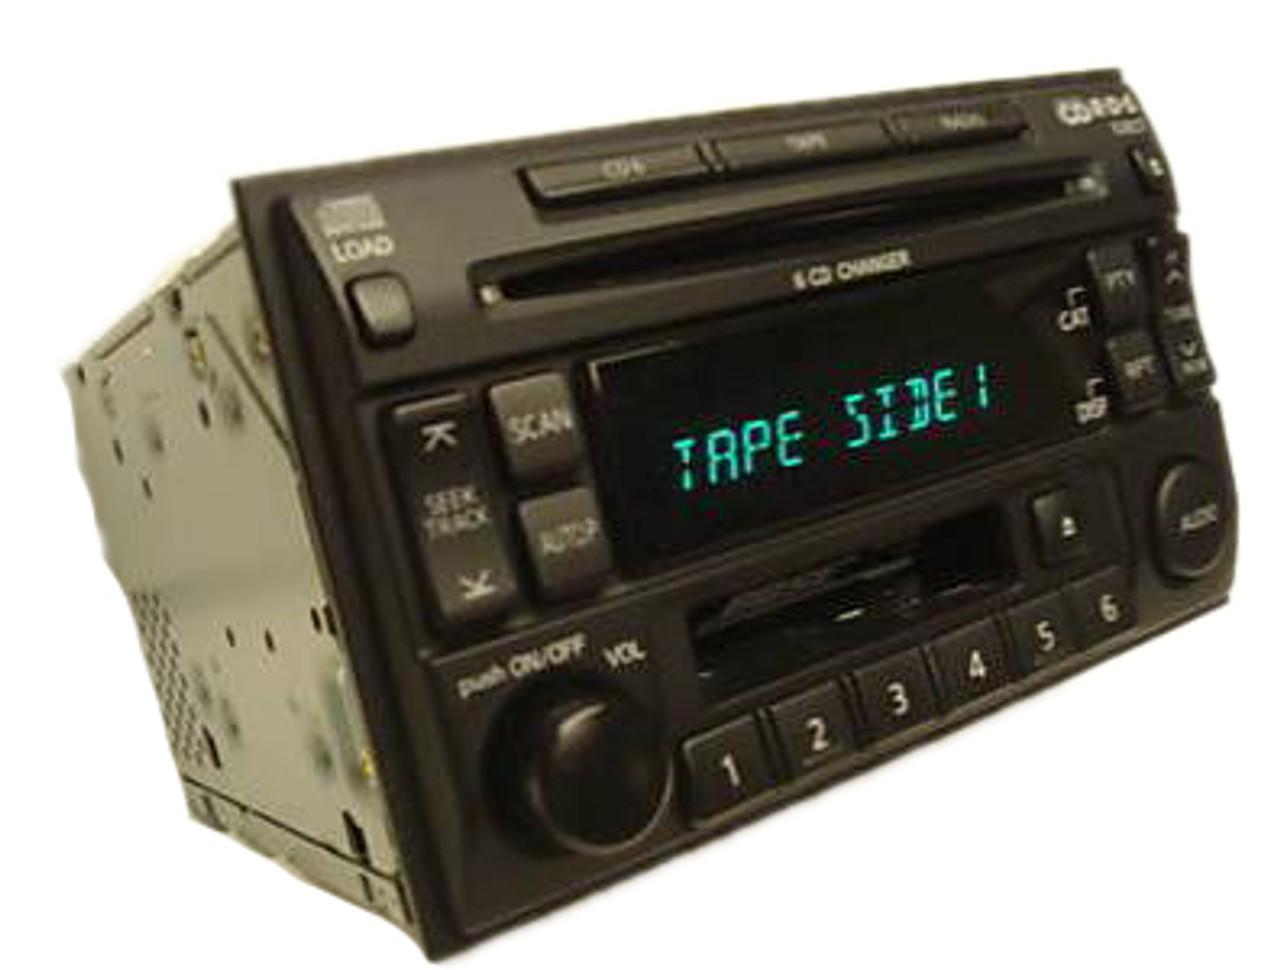 medium resolution of  nissan pathfinder se le maxima bose radio 6 disc changer tape cassette cd player pn